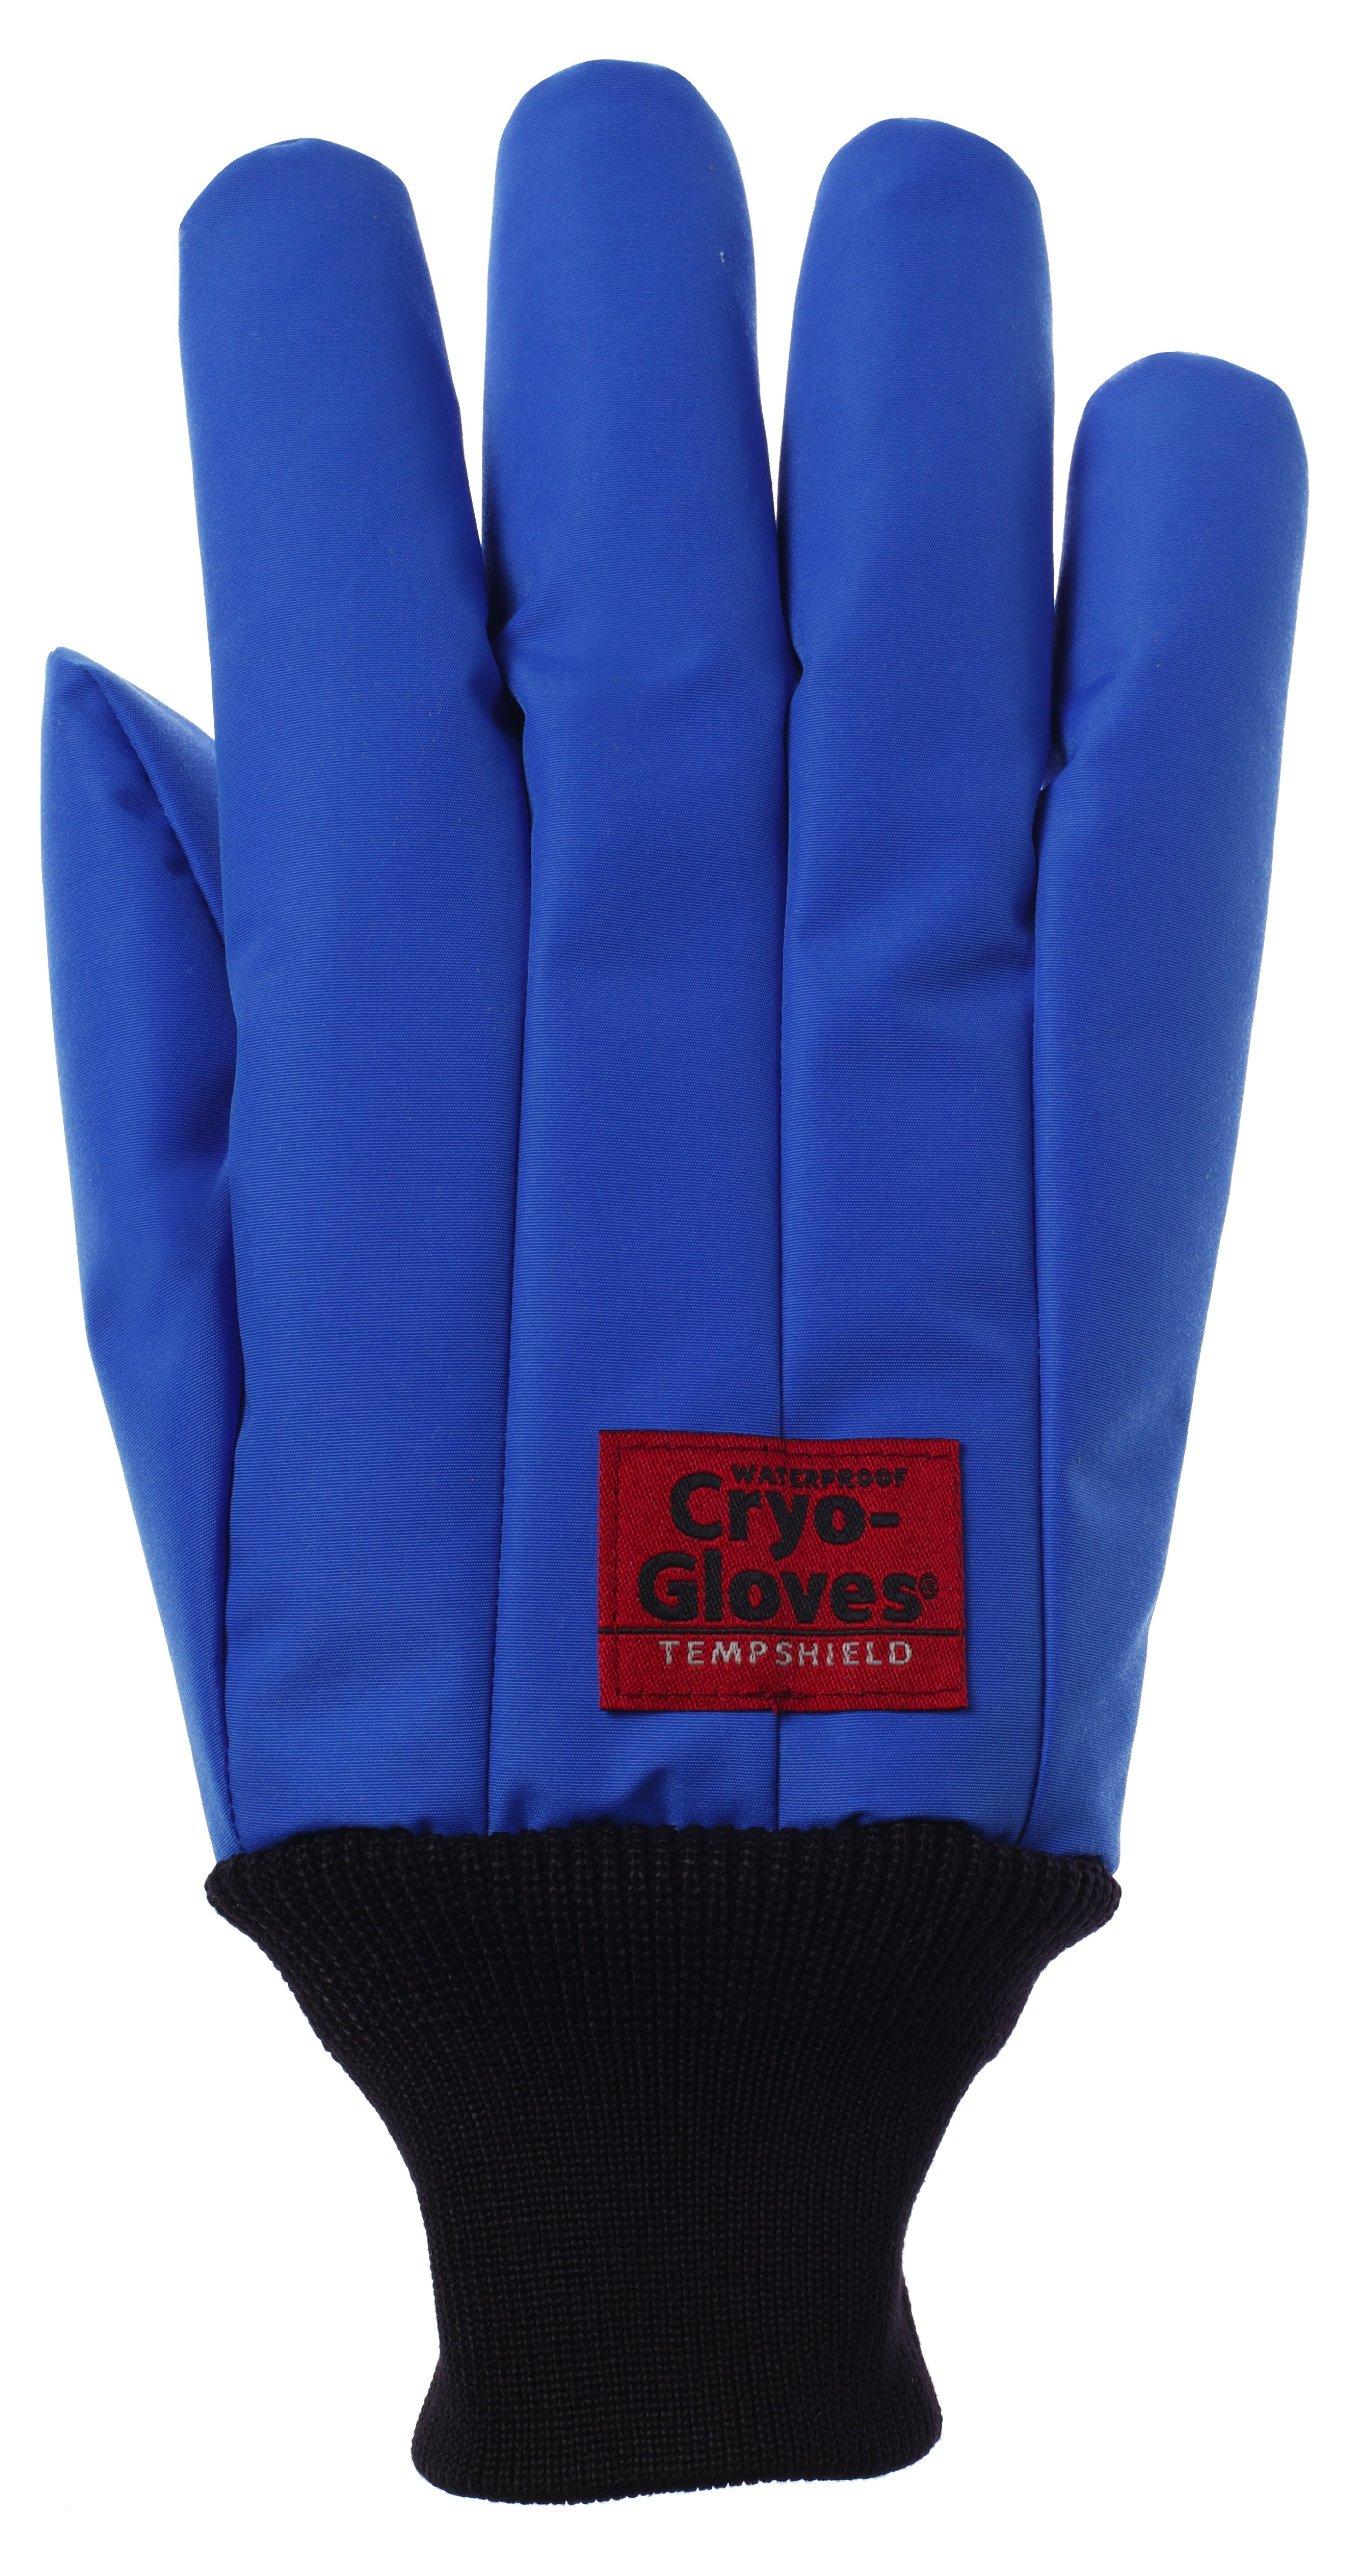 Waterproof Cryo-Gloves WRMWP Cryogenic Gloves, Wrist Length, Medium